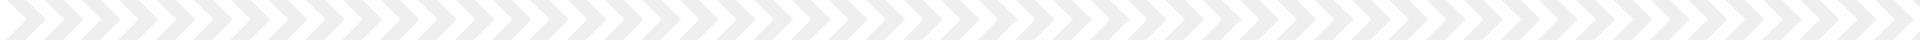 Bedruckt Feuerzeug Piezo bestellen Shop Schweiz online Preis günstig